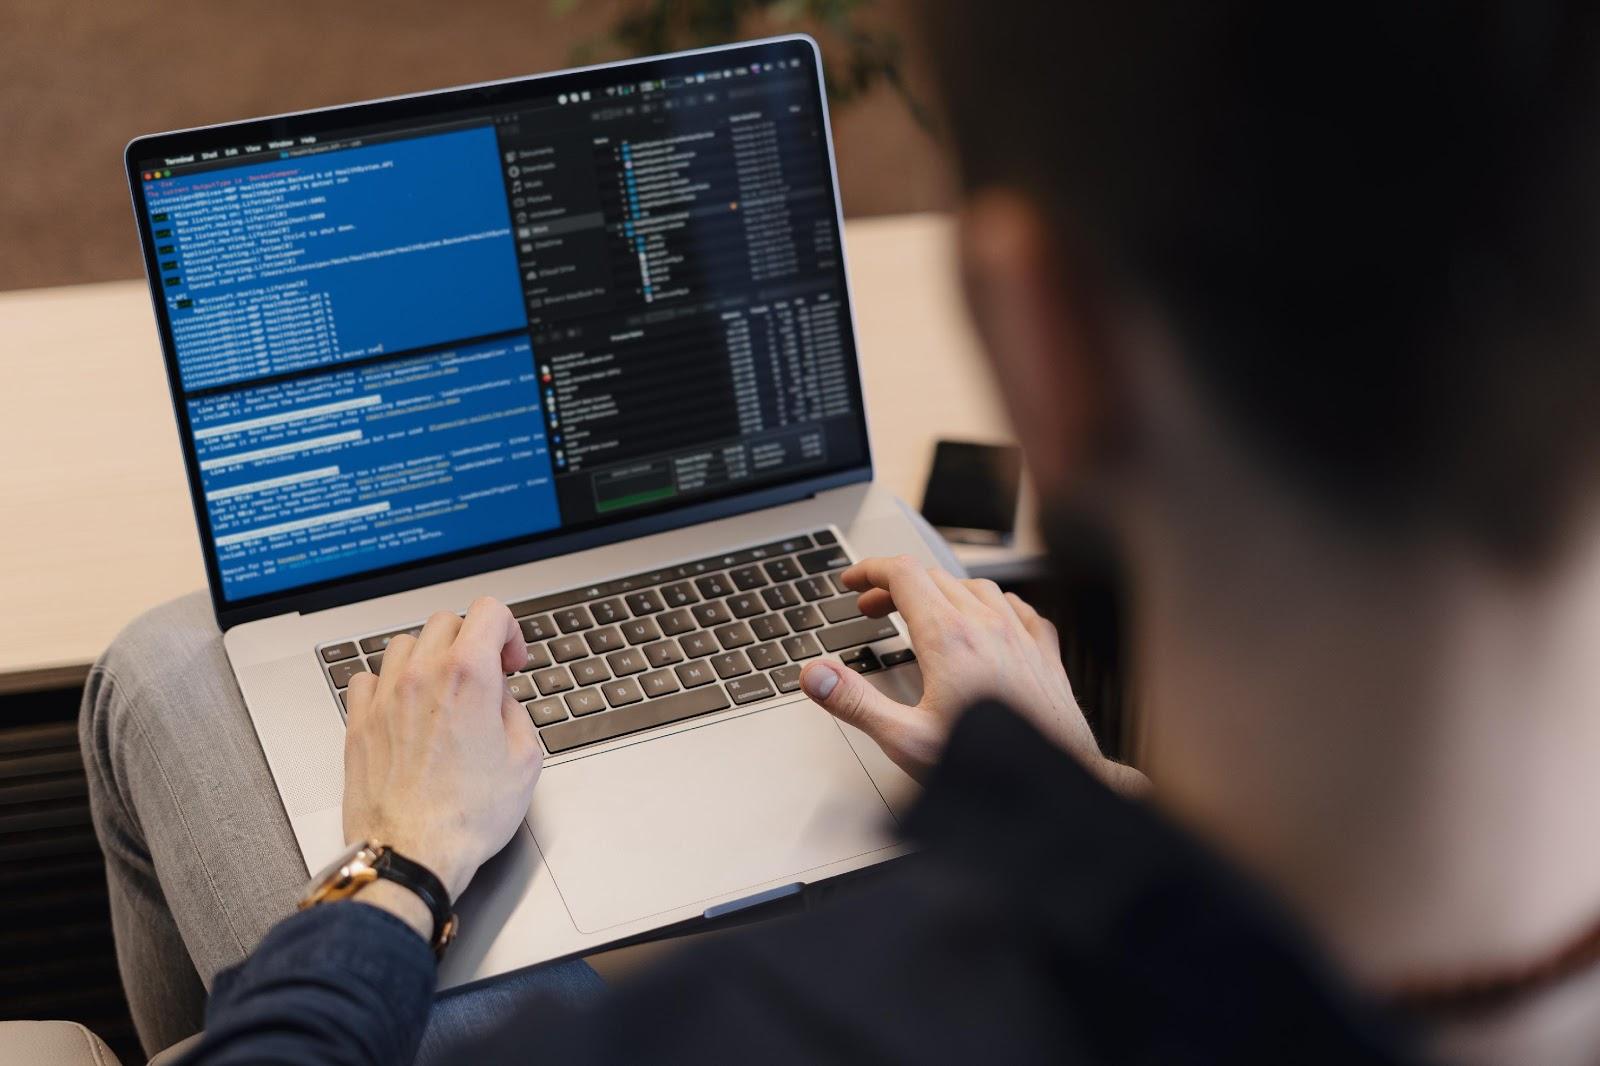 back-end web development?